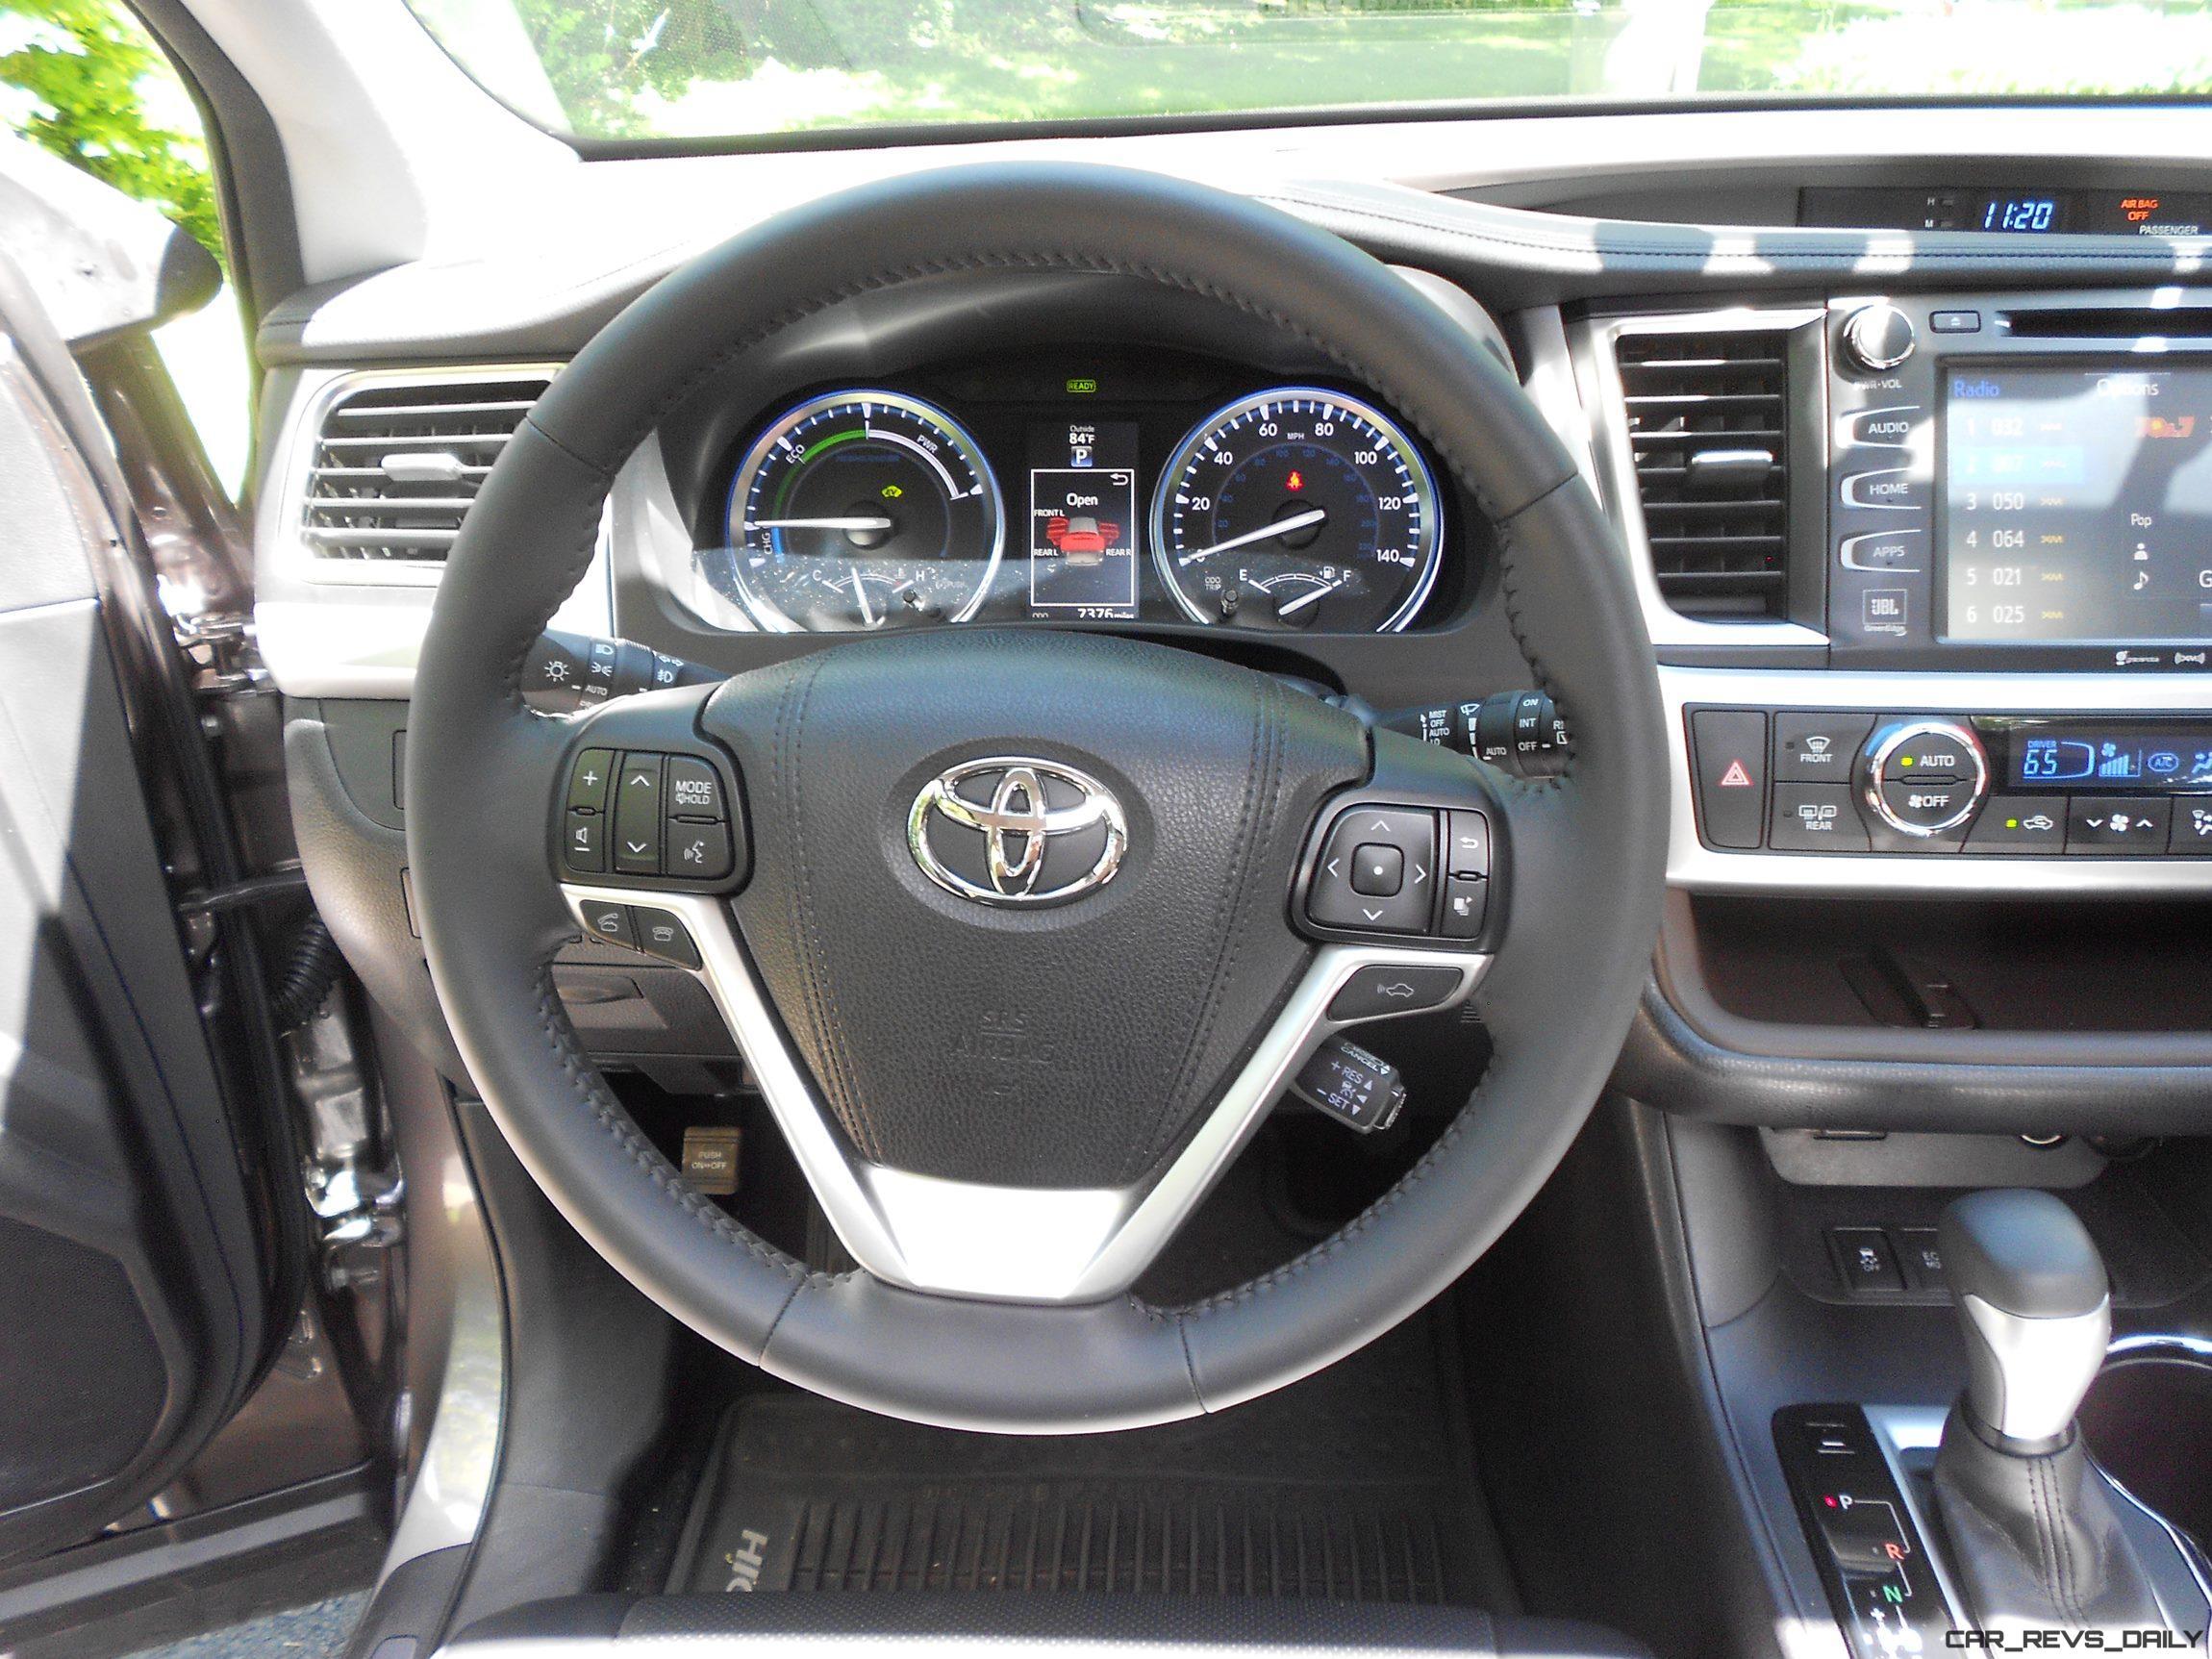 2017 Toyota Highlander Accessories >> 2016 Highlander Hybrid - Interior 9